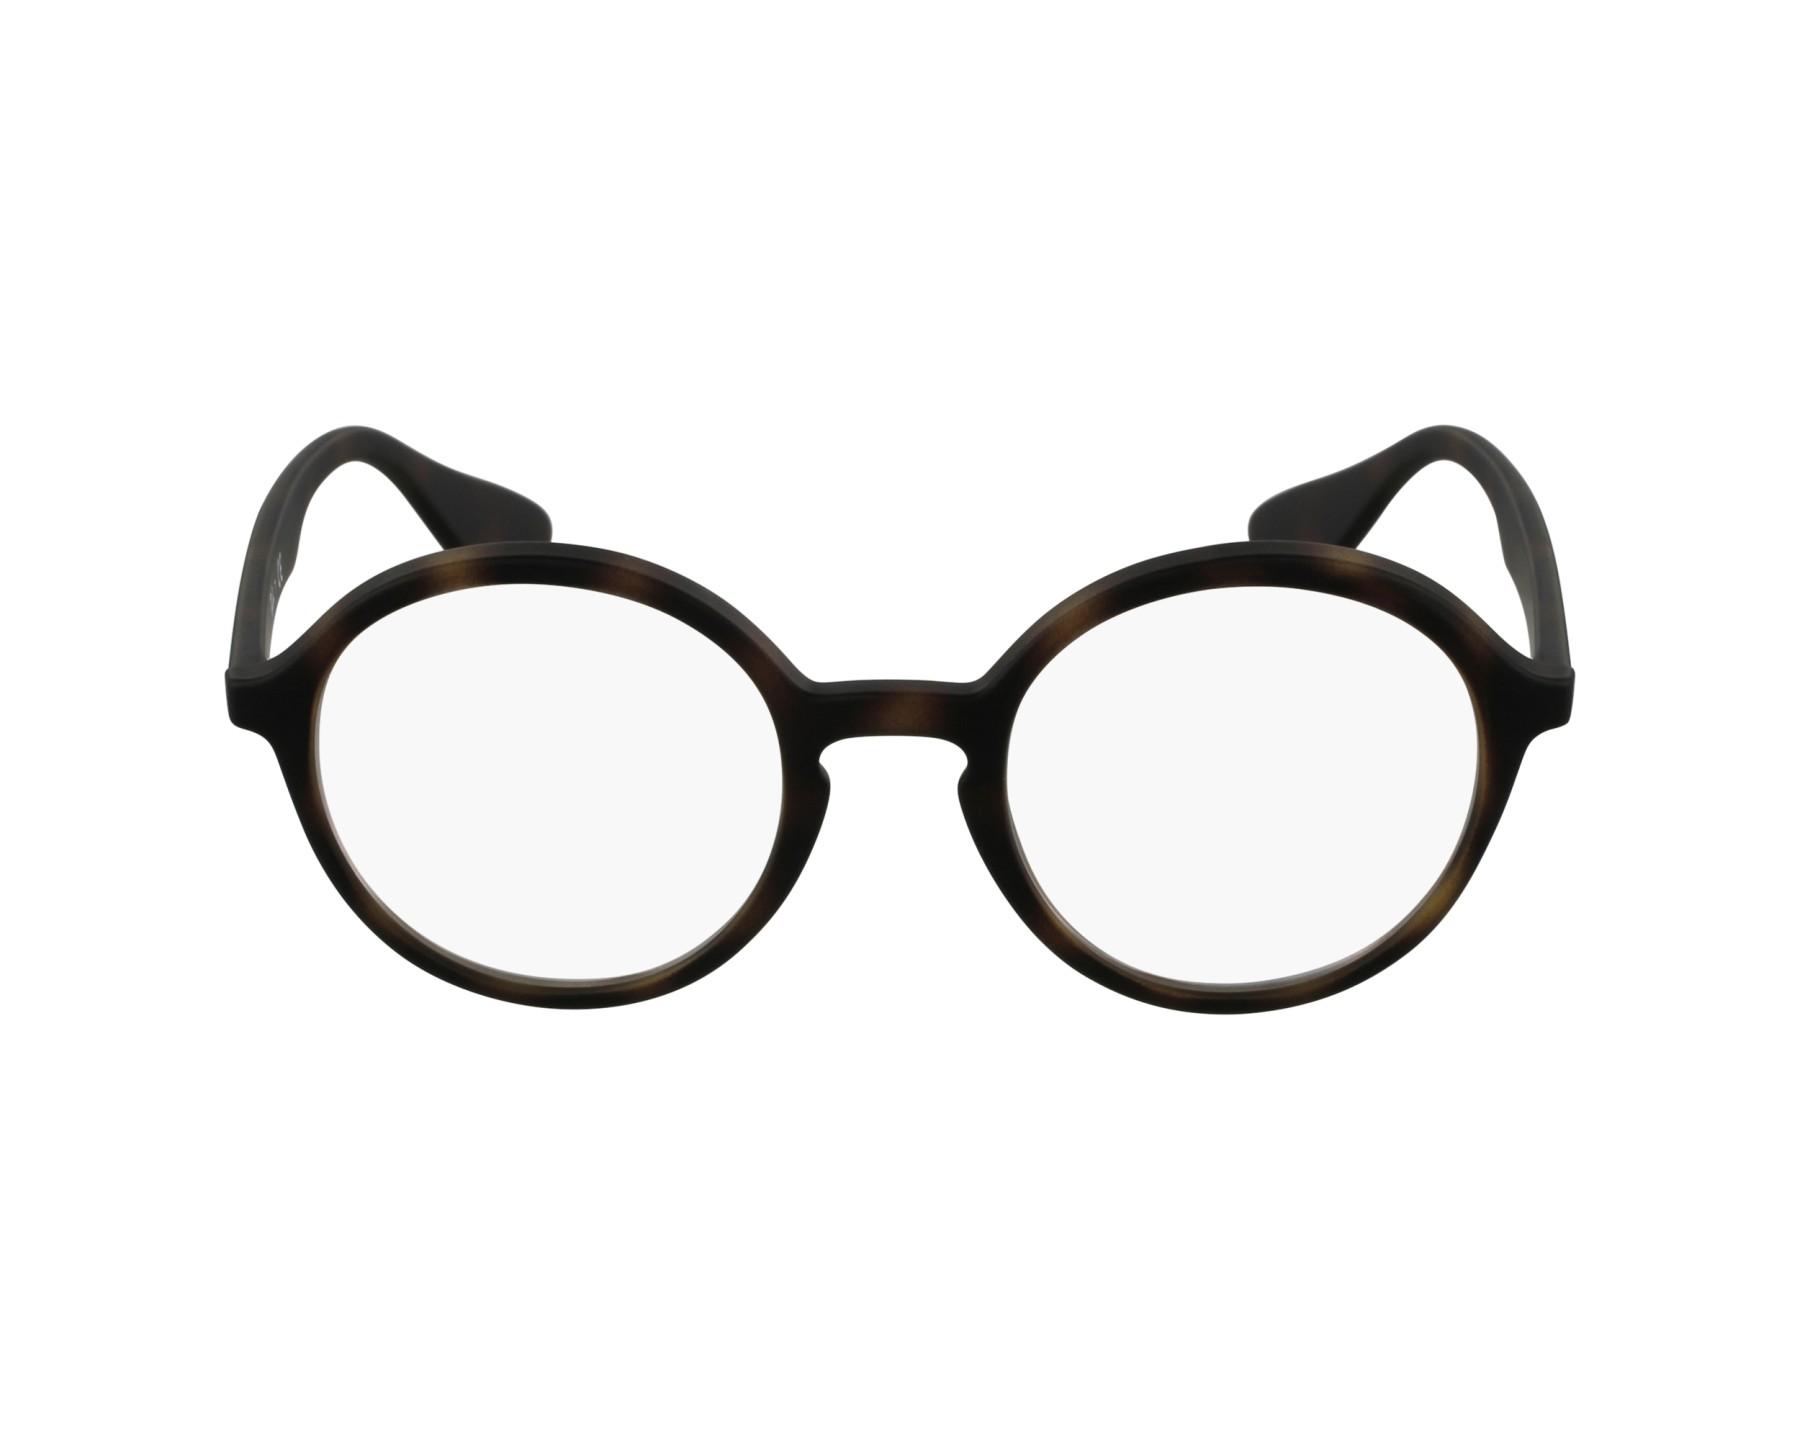 eyeglasses Ray-Ban RX-7075 5365 47-20 Havana profile view 8b5dbf69934da